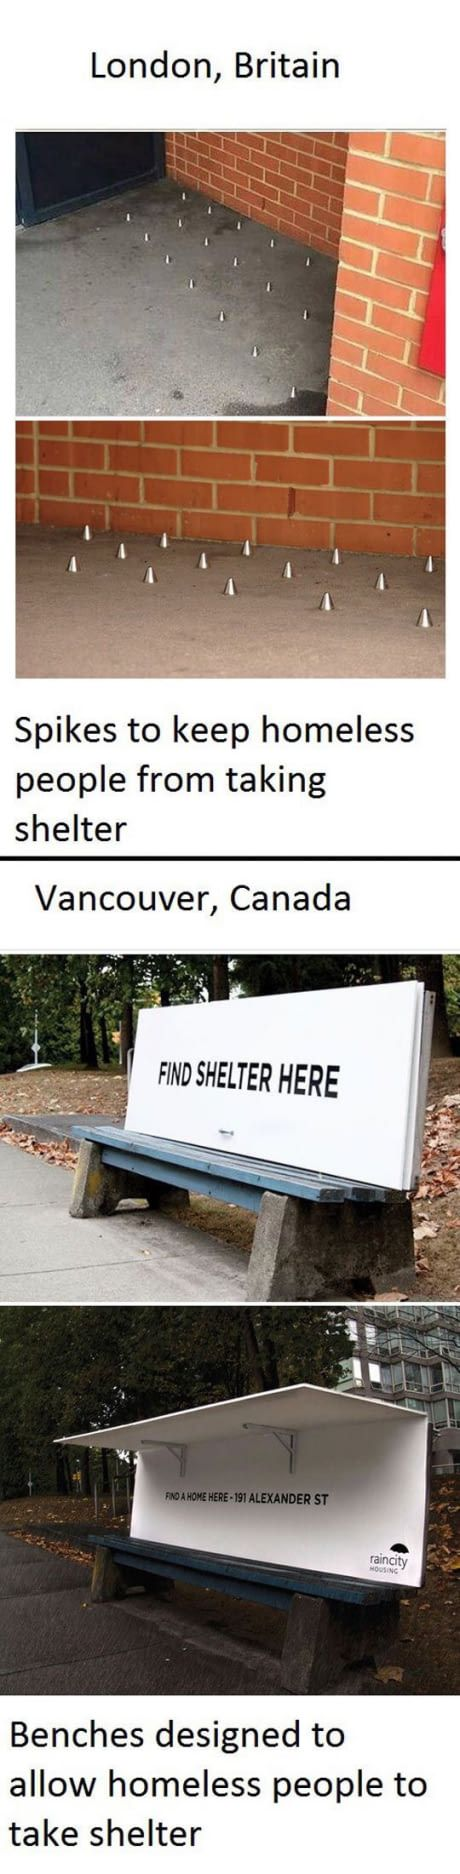 Canada again good job